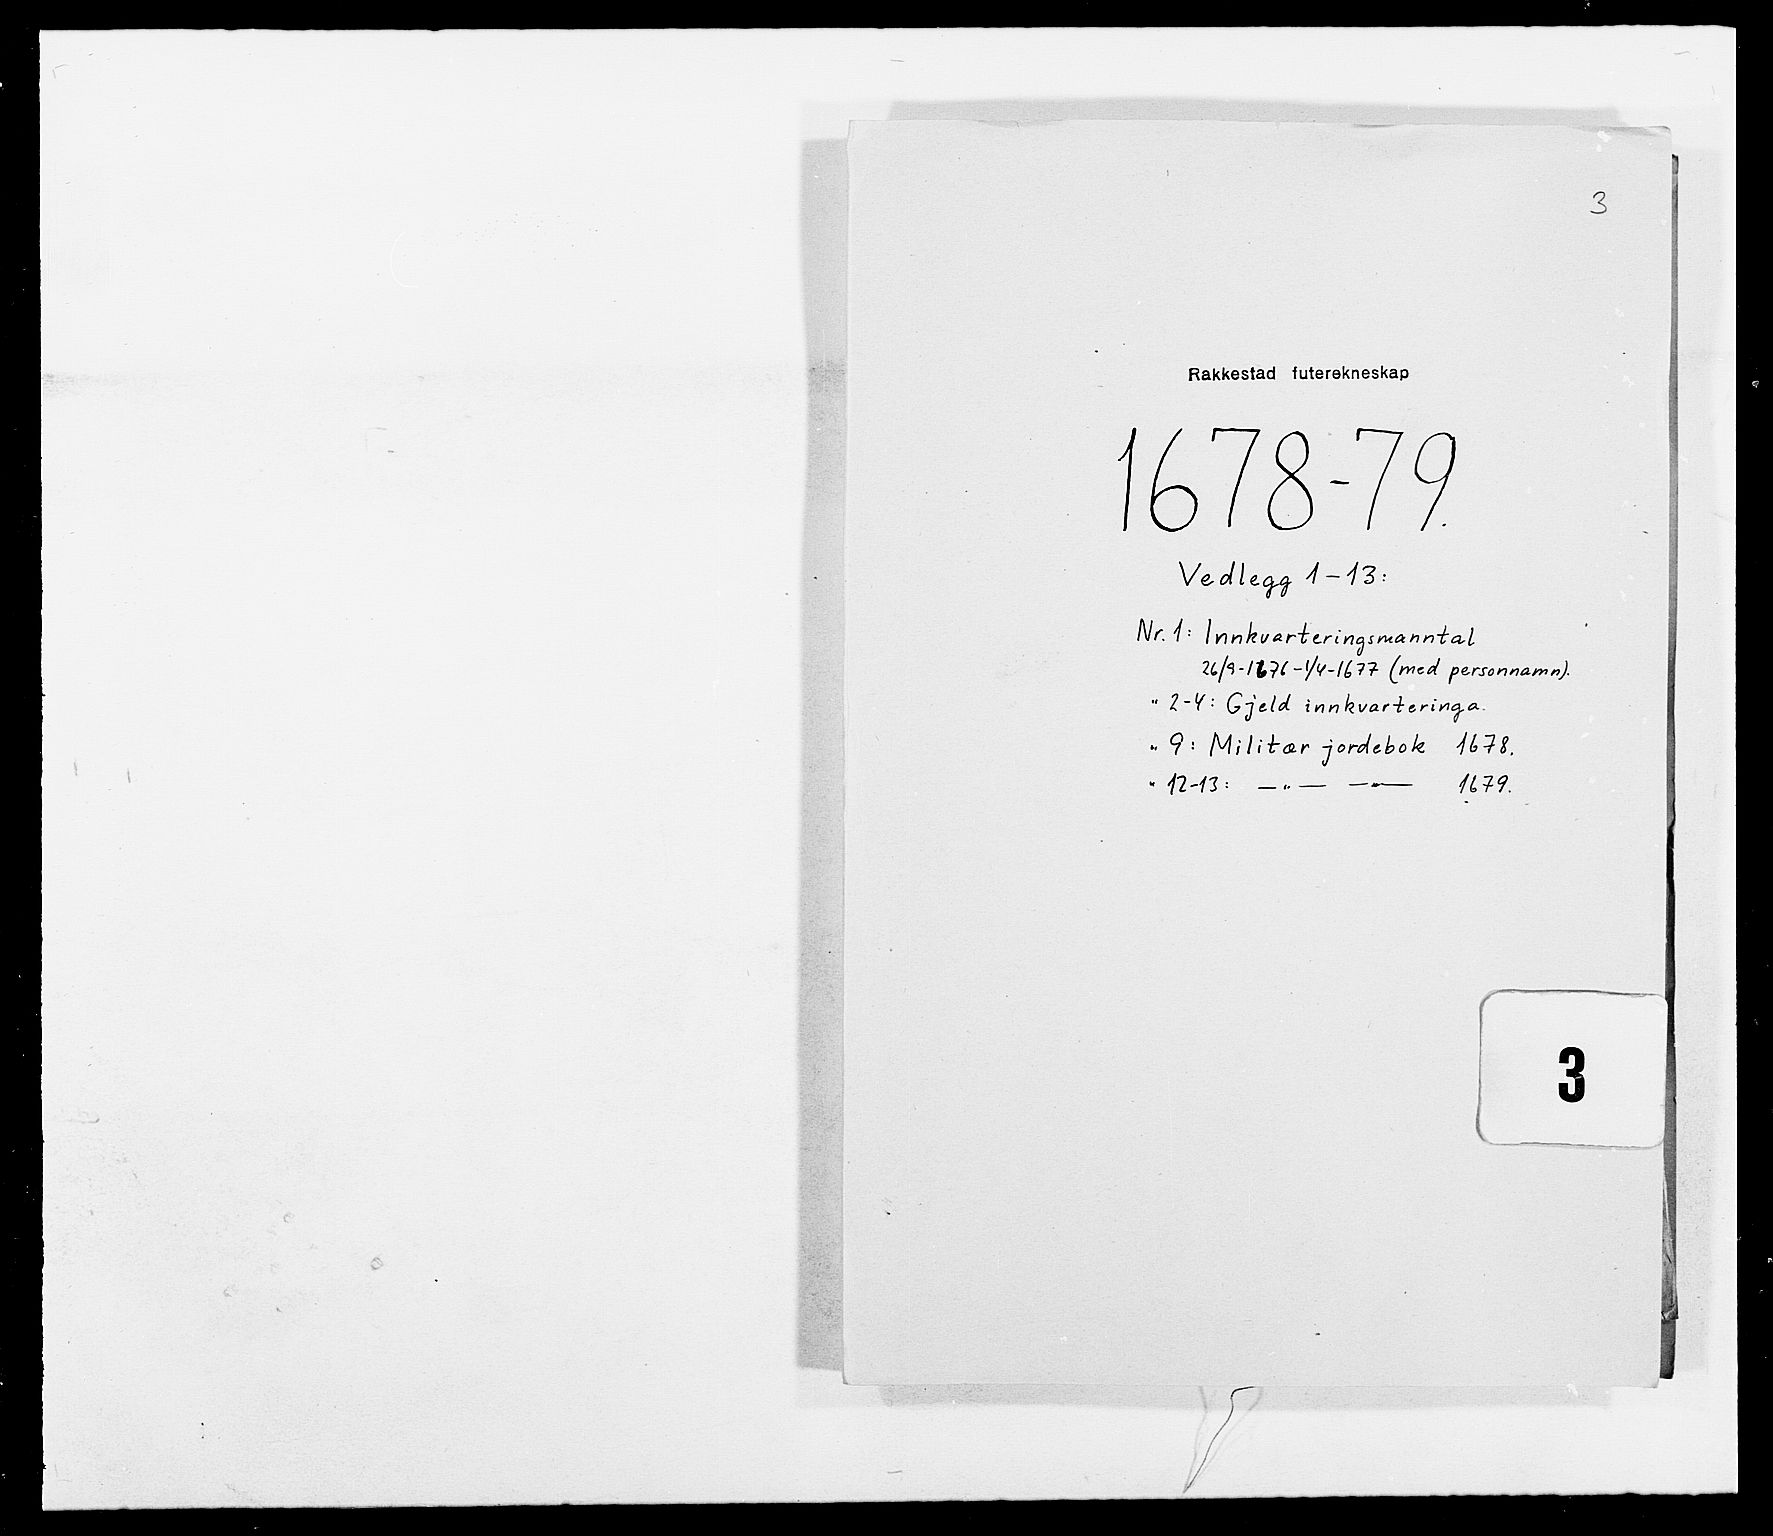 RA, Rentekammeret inntil 1814, Reviderte regnskaper, Fogderegnskap, R05/L0271: Fogderegnskap Rakkestad, 1678-1679, s. 490